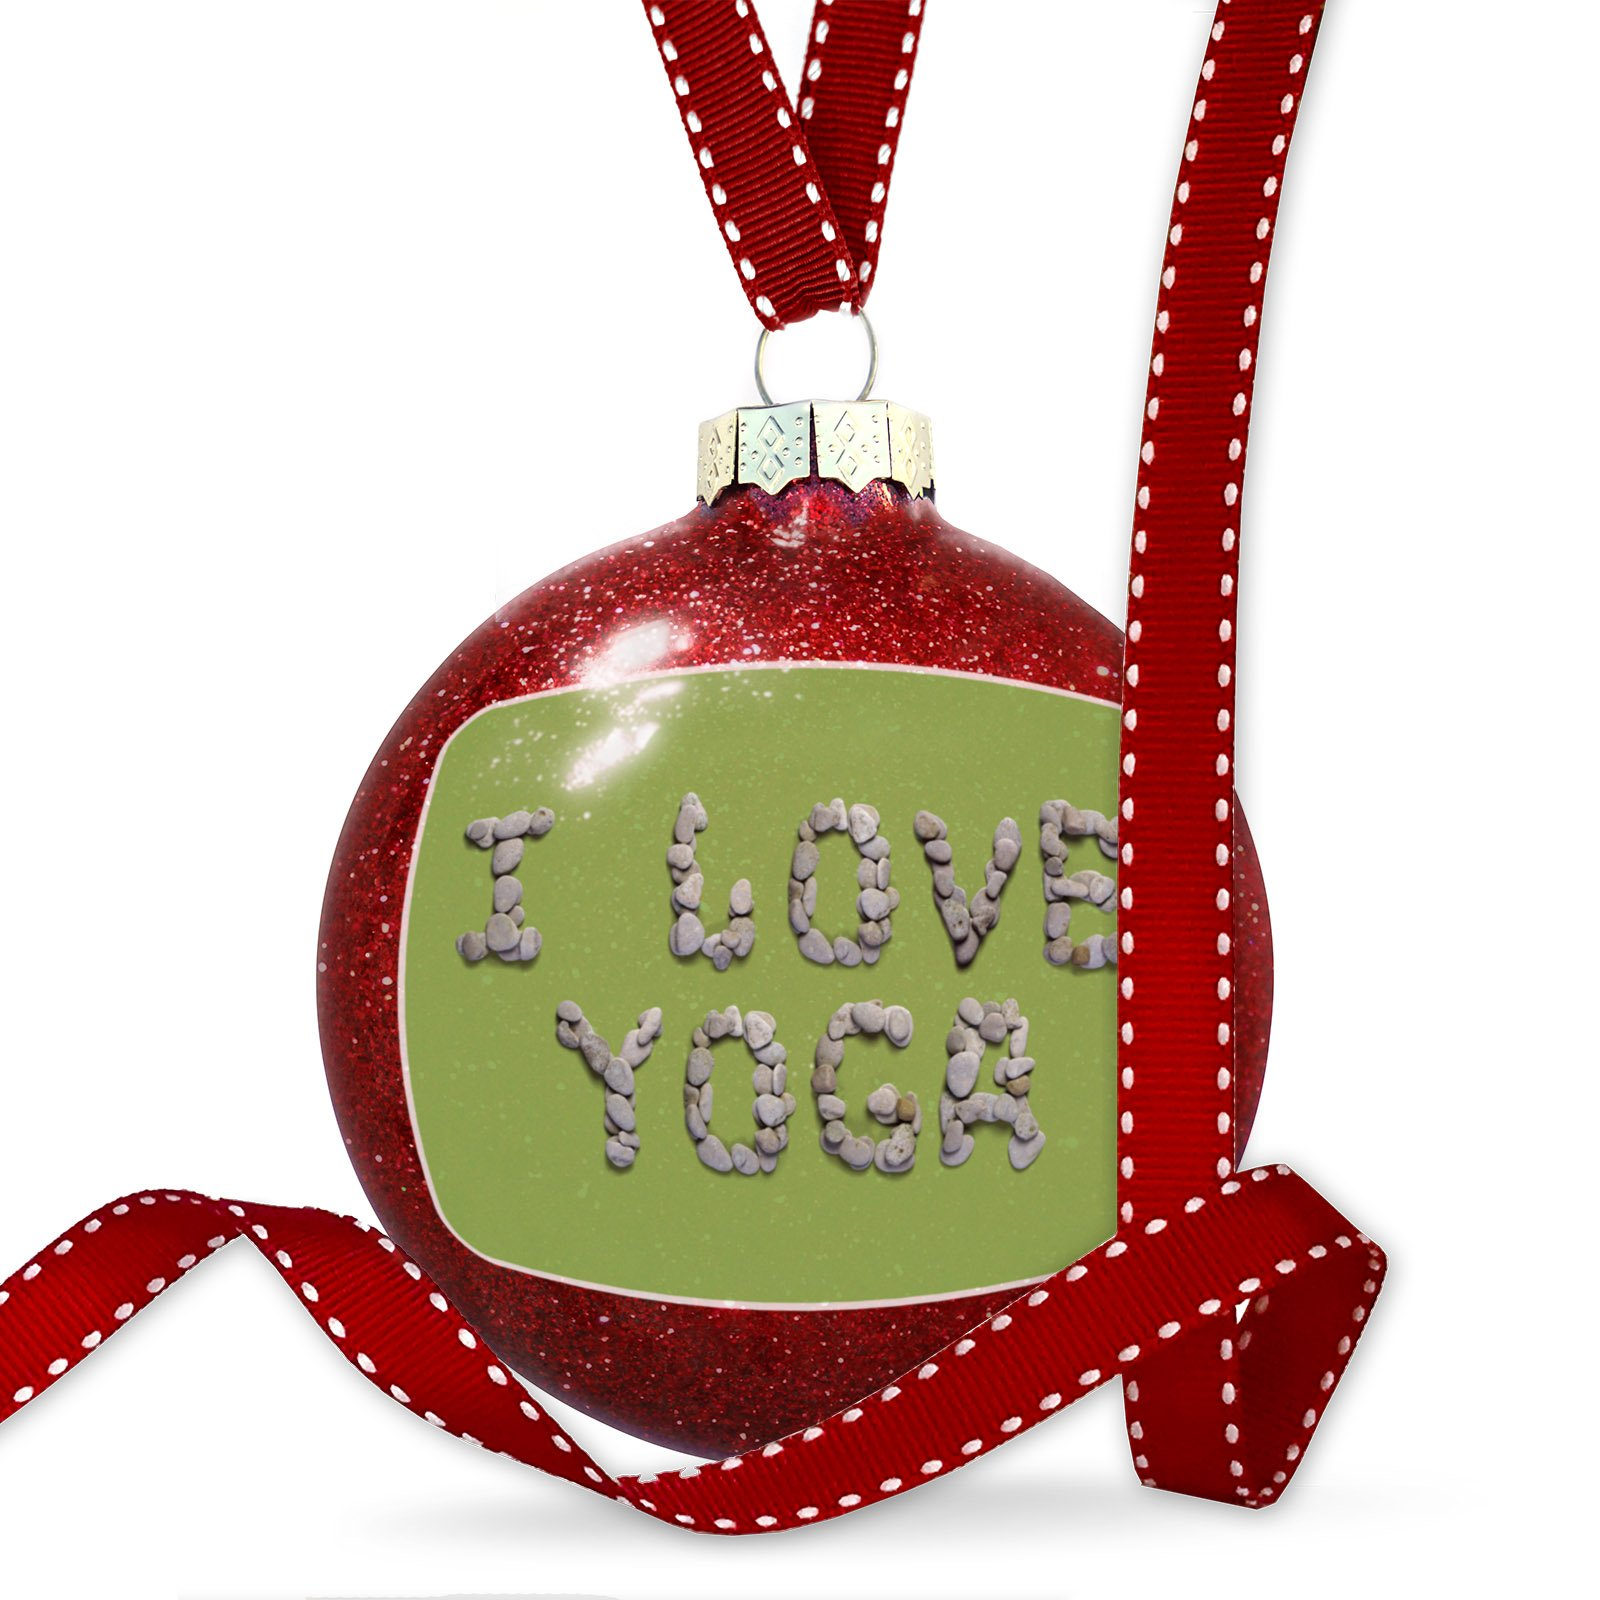 Christmas Decoration I Love Yoga Spa Stones Rocks Ornament